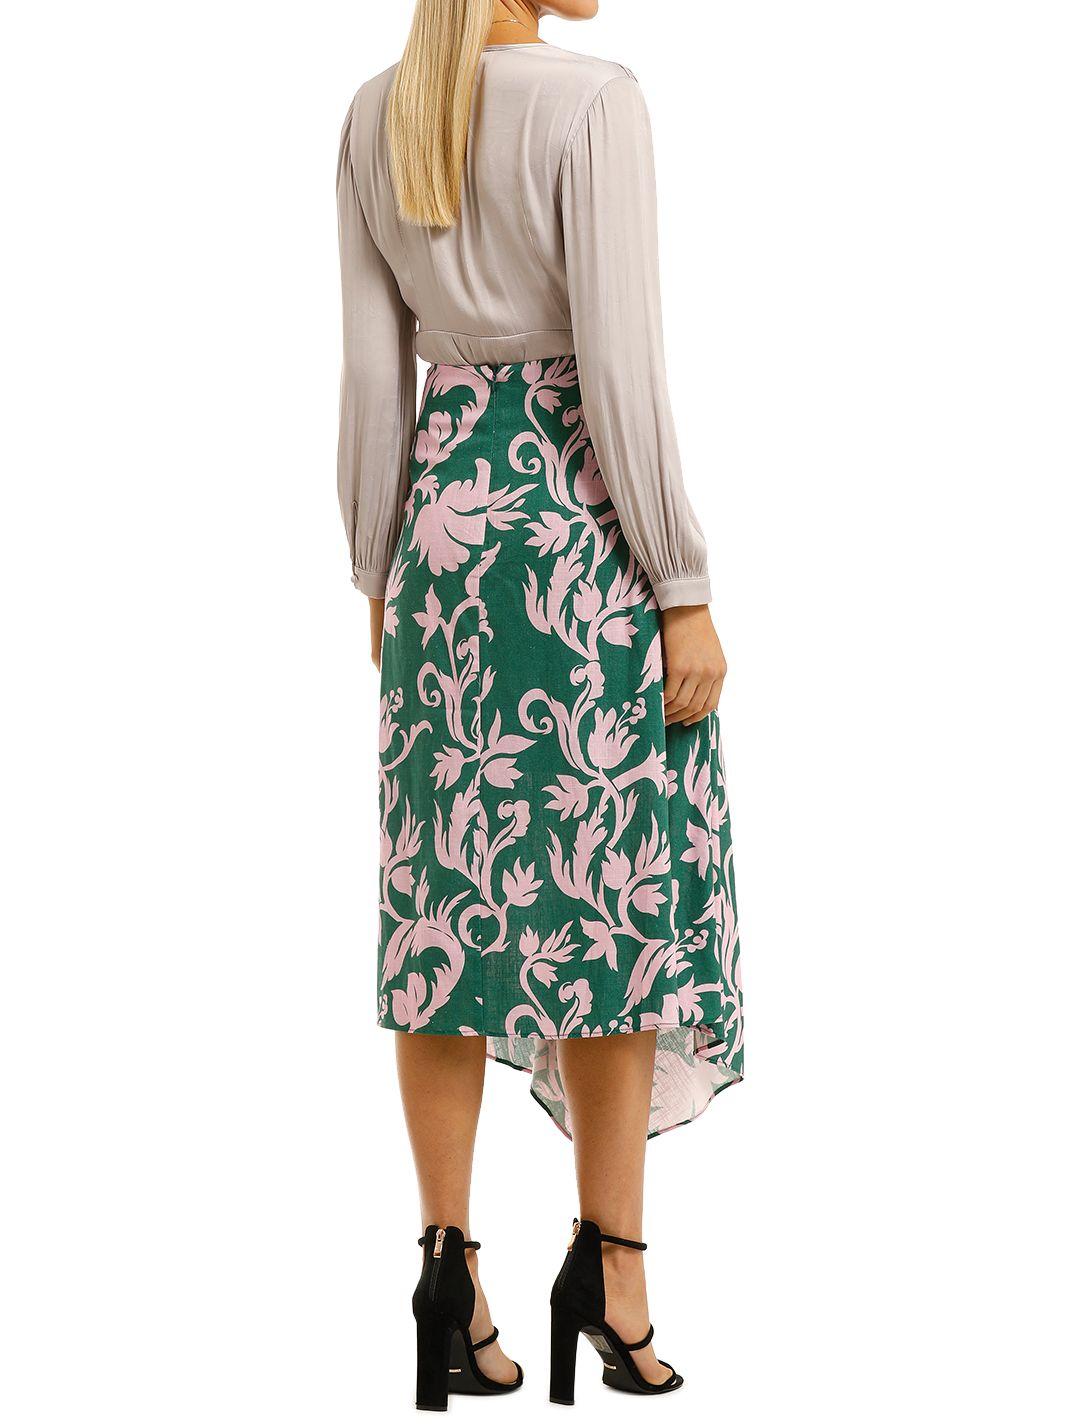 Keepsake-the-Label-Wistful-Skirt-Jade-Baroque-Back